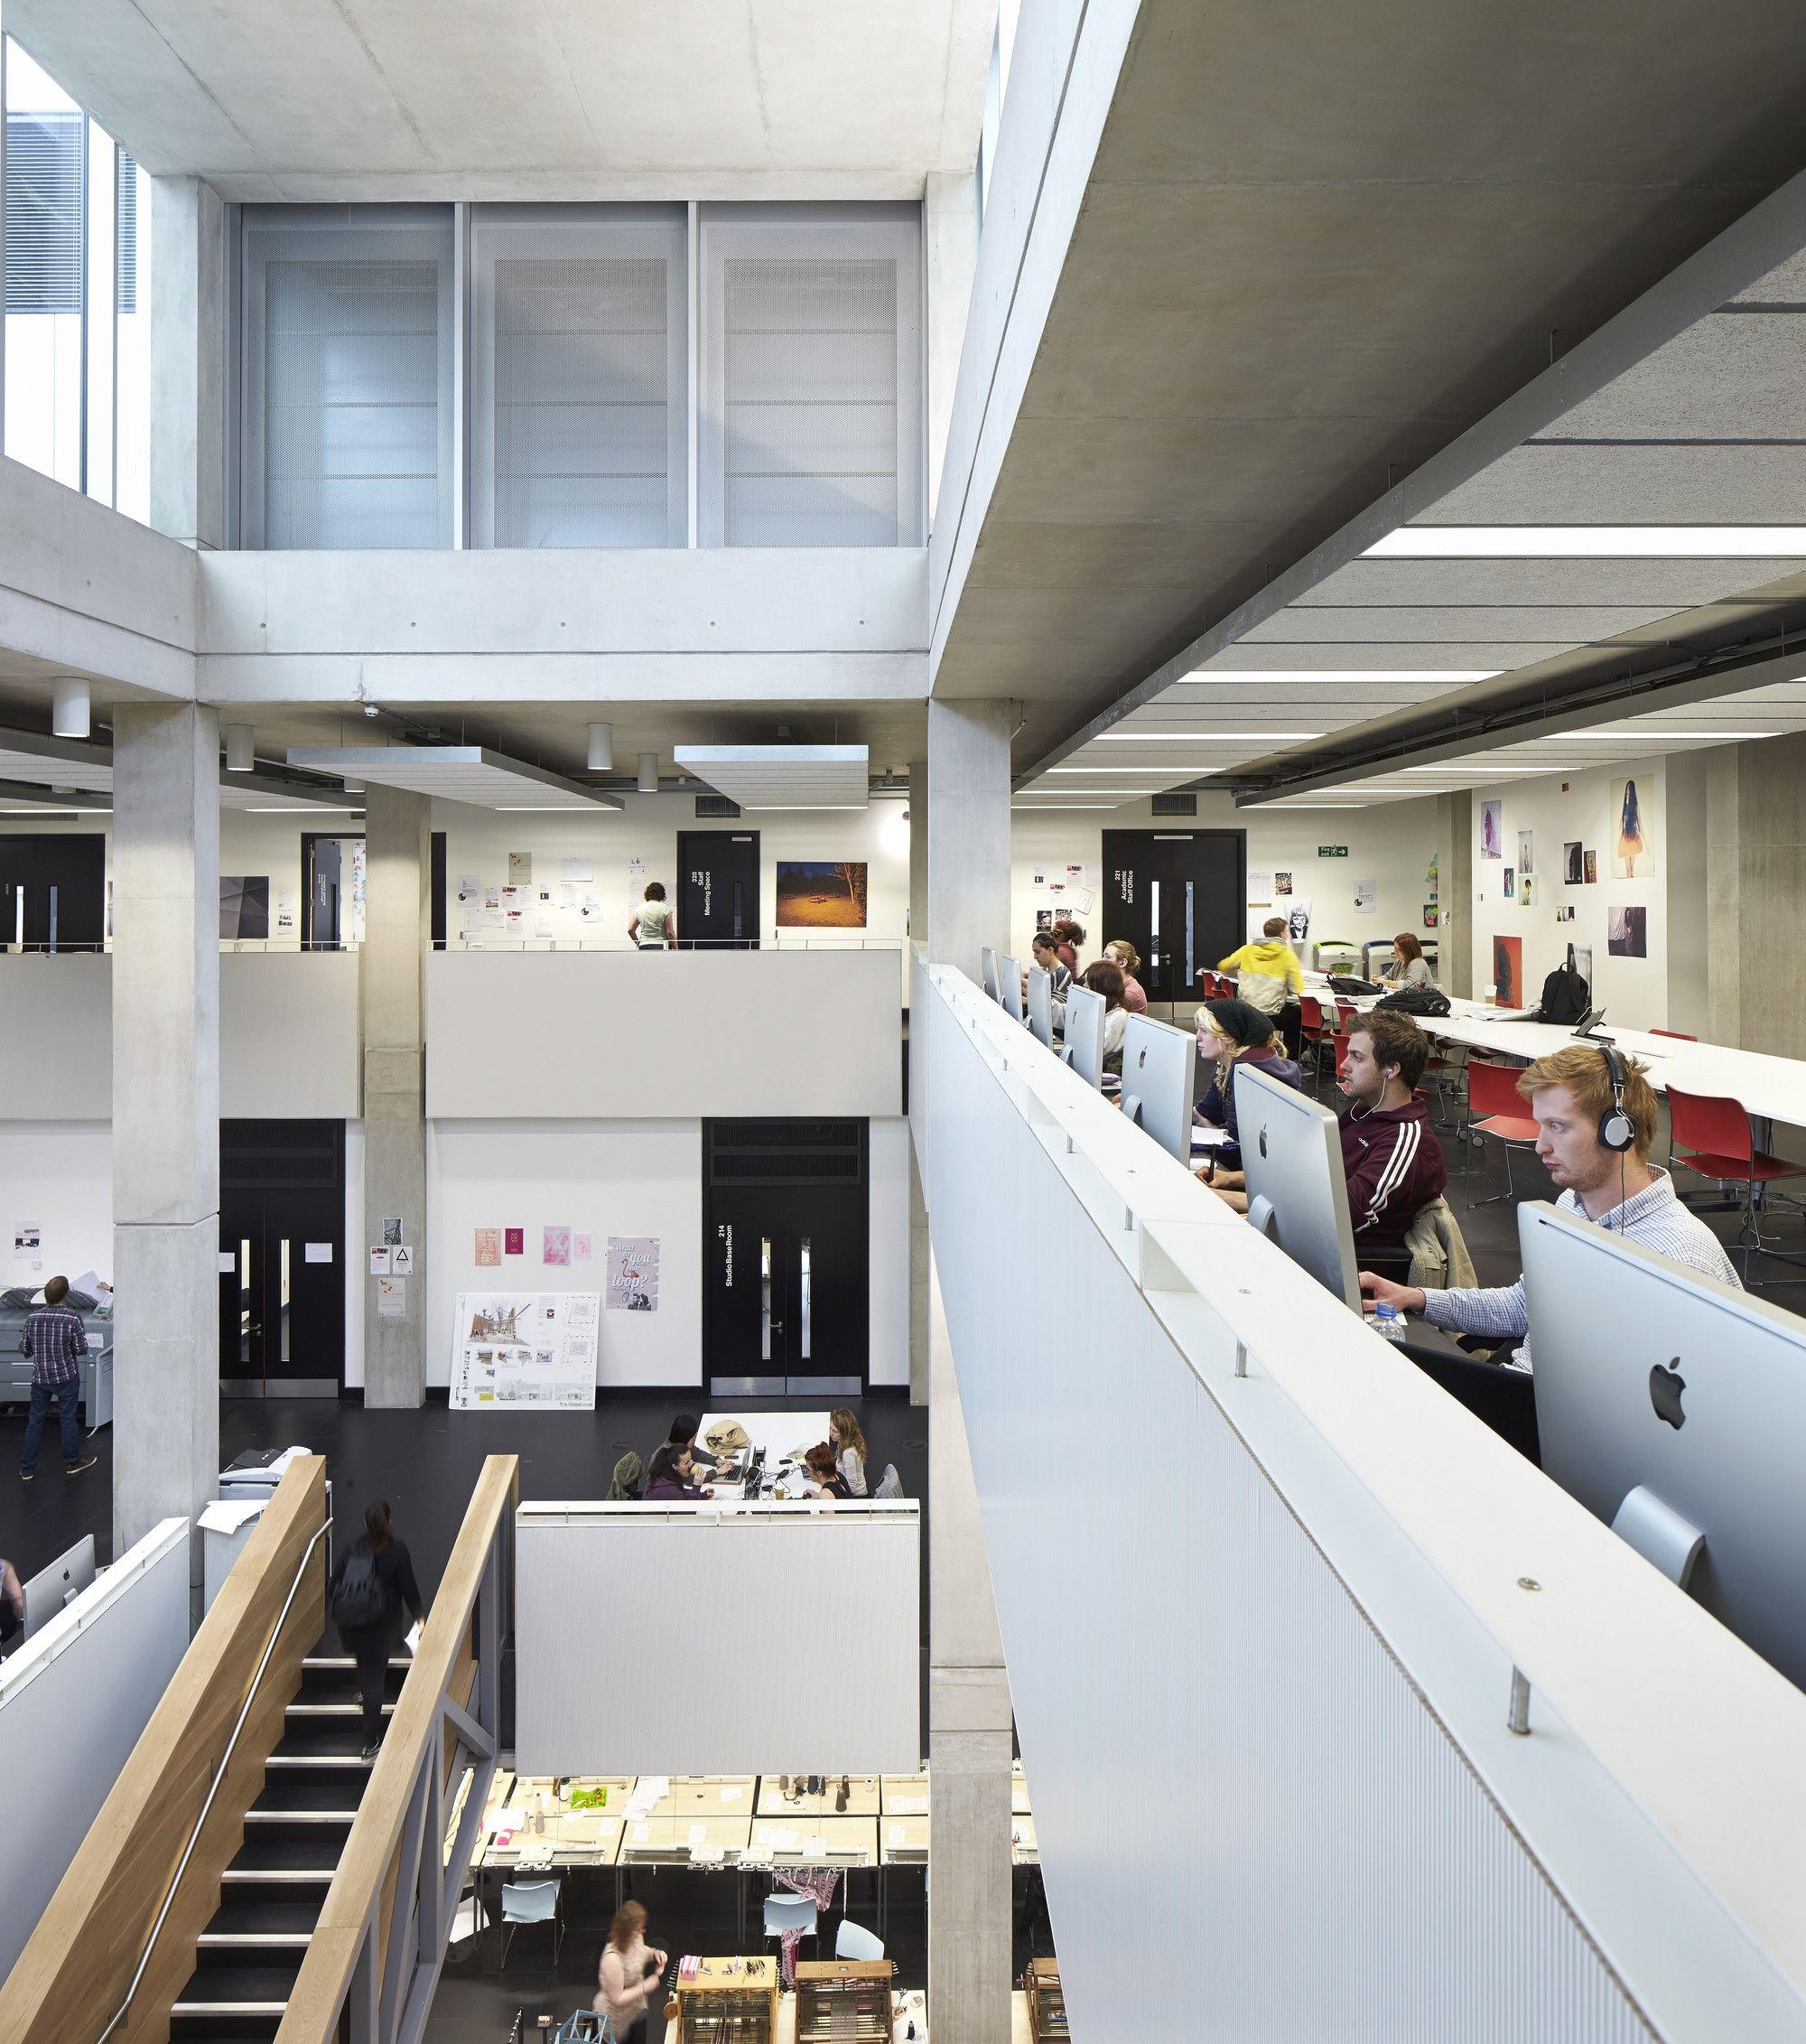 Architecture School Studio mit architecture studio | architecture schools | pinterest